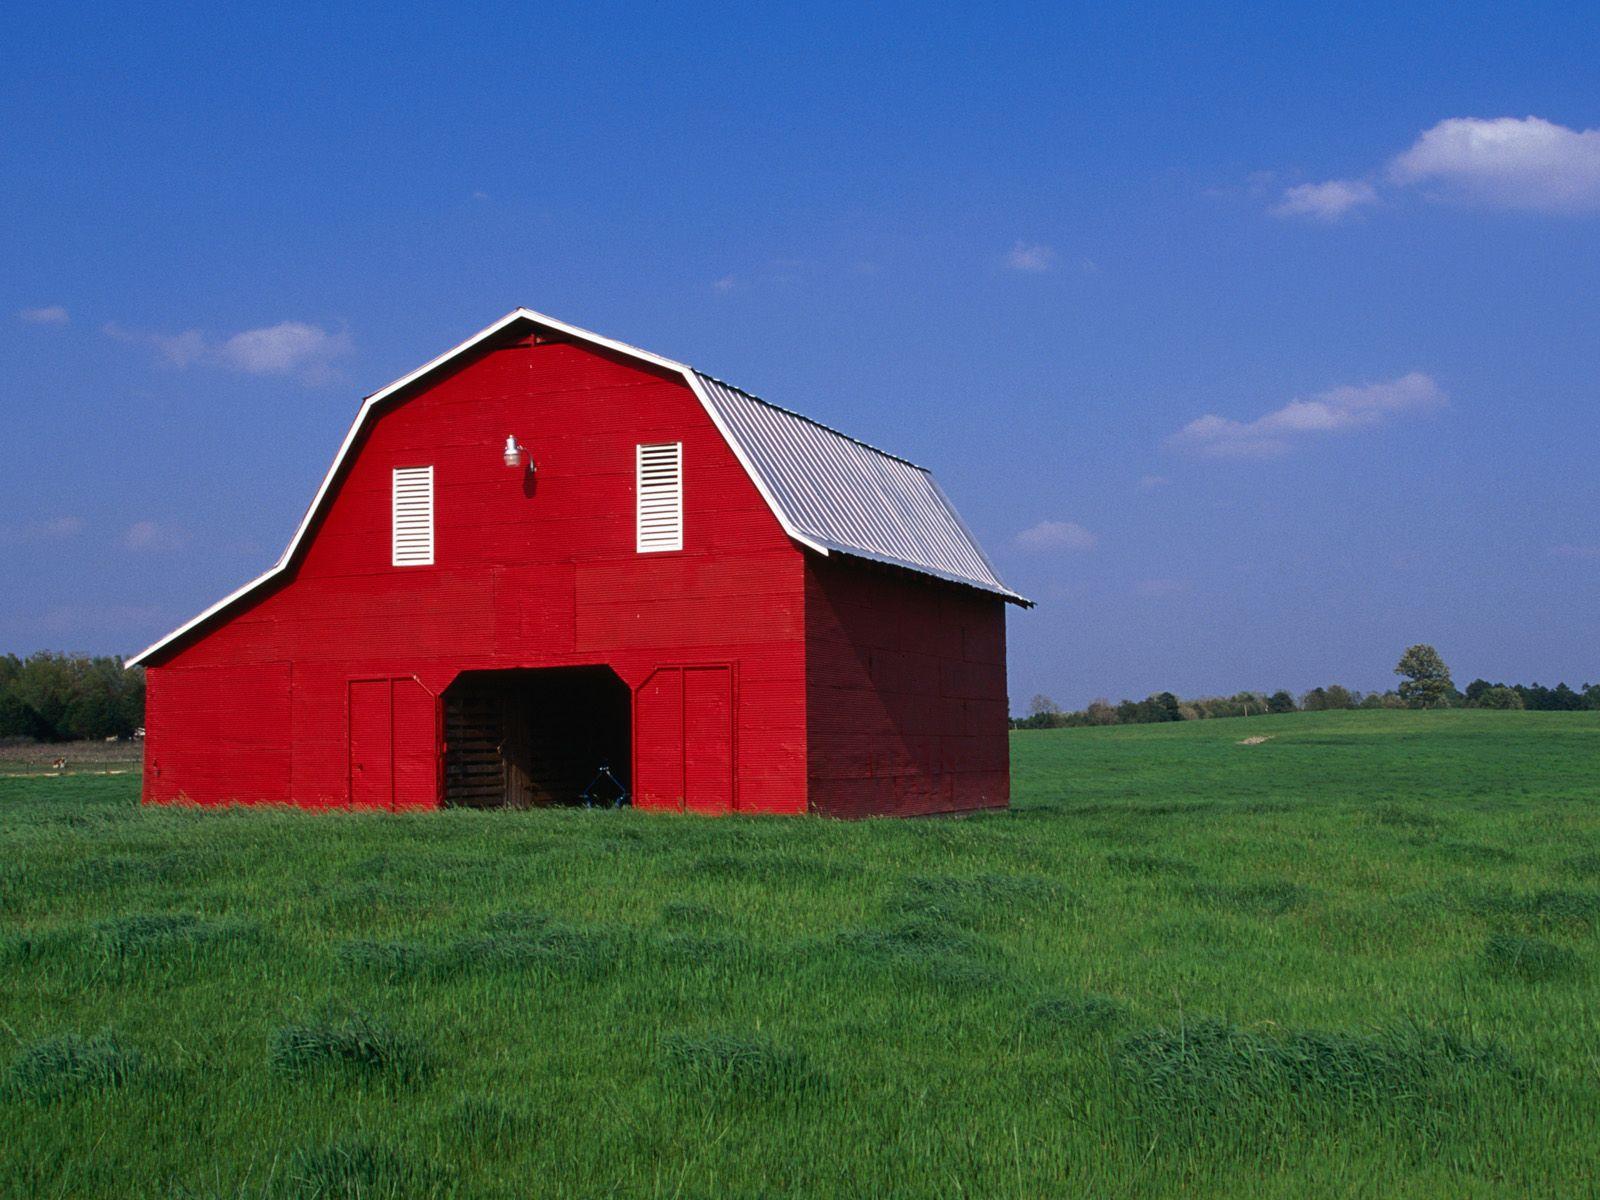 Barn red barn north of batesville arkansas travel pics for Red barn house